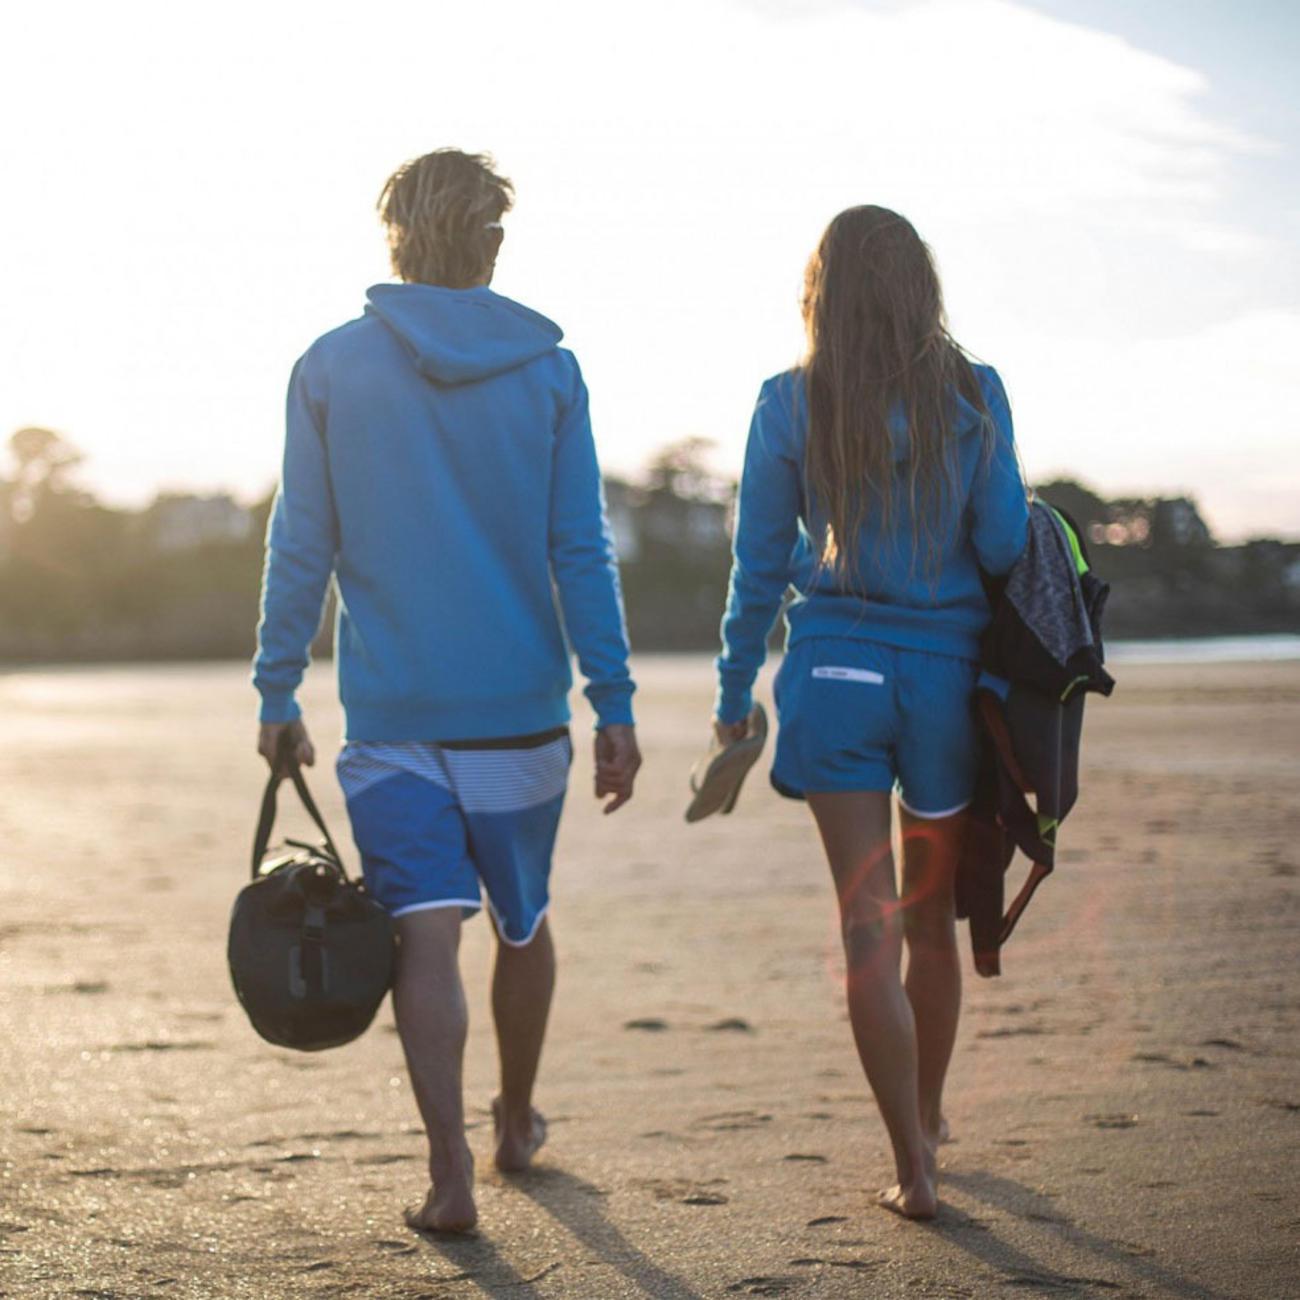 Astern Boardshort 18 | men